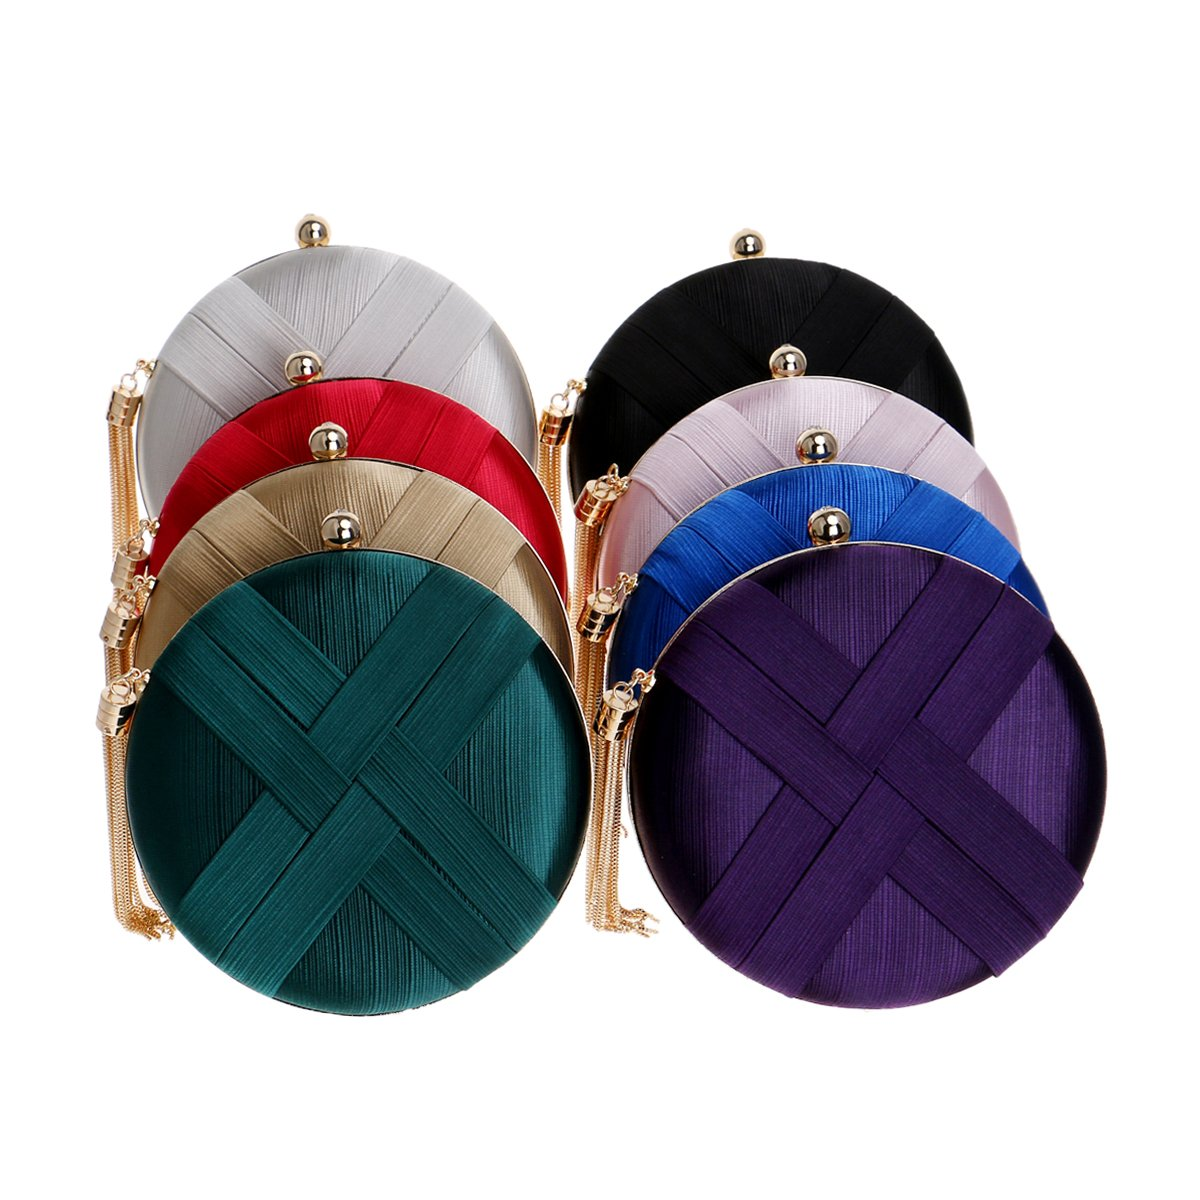 MY Womens Round Satin Evening Clutch Bags Tassel Pendant Silk Purse Evening Handbags for Formal Party Bridal Wedding Silver MY-001